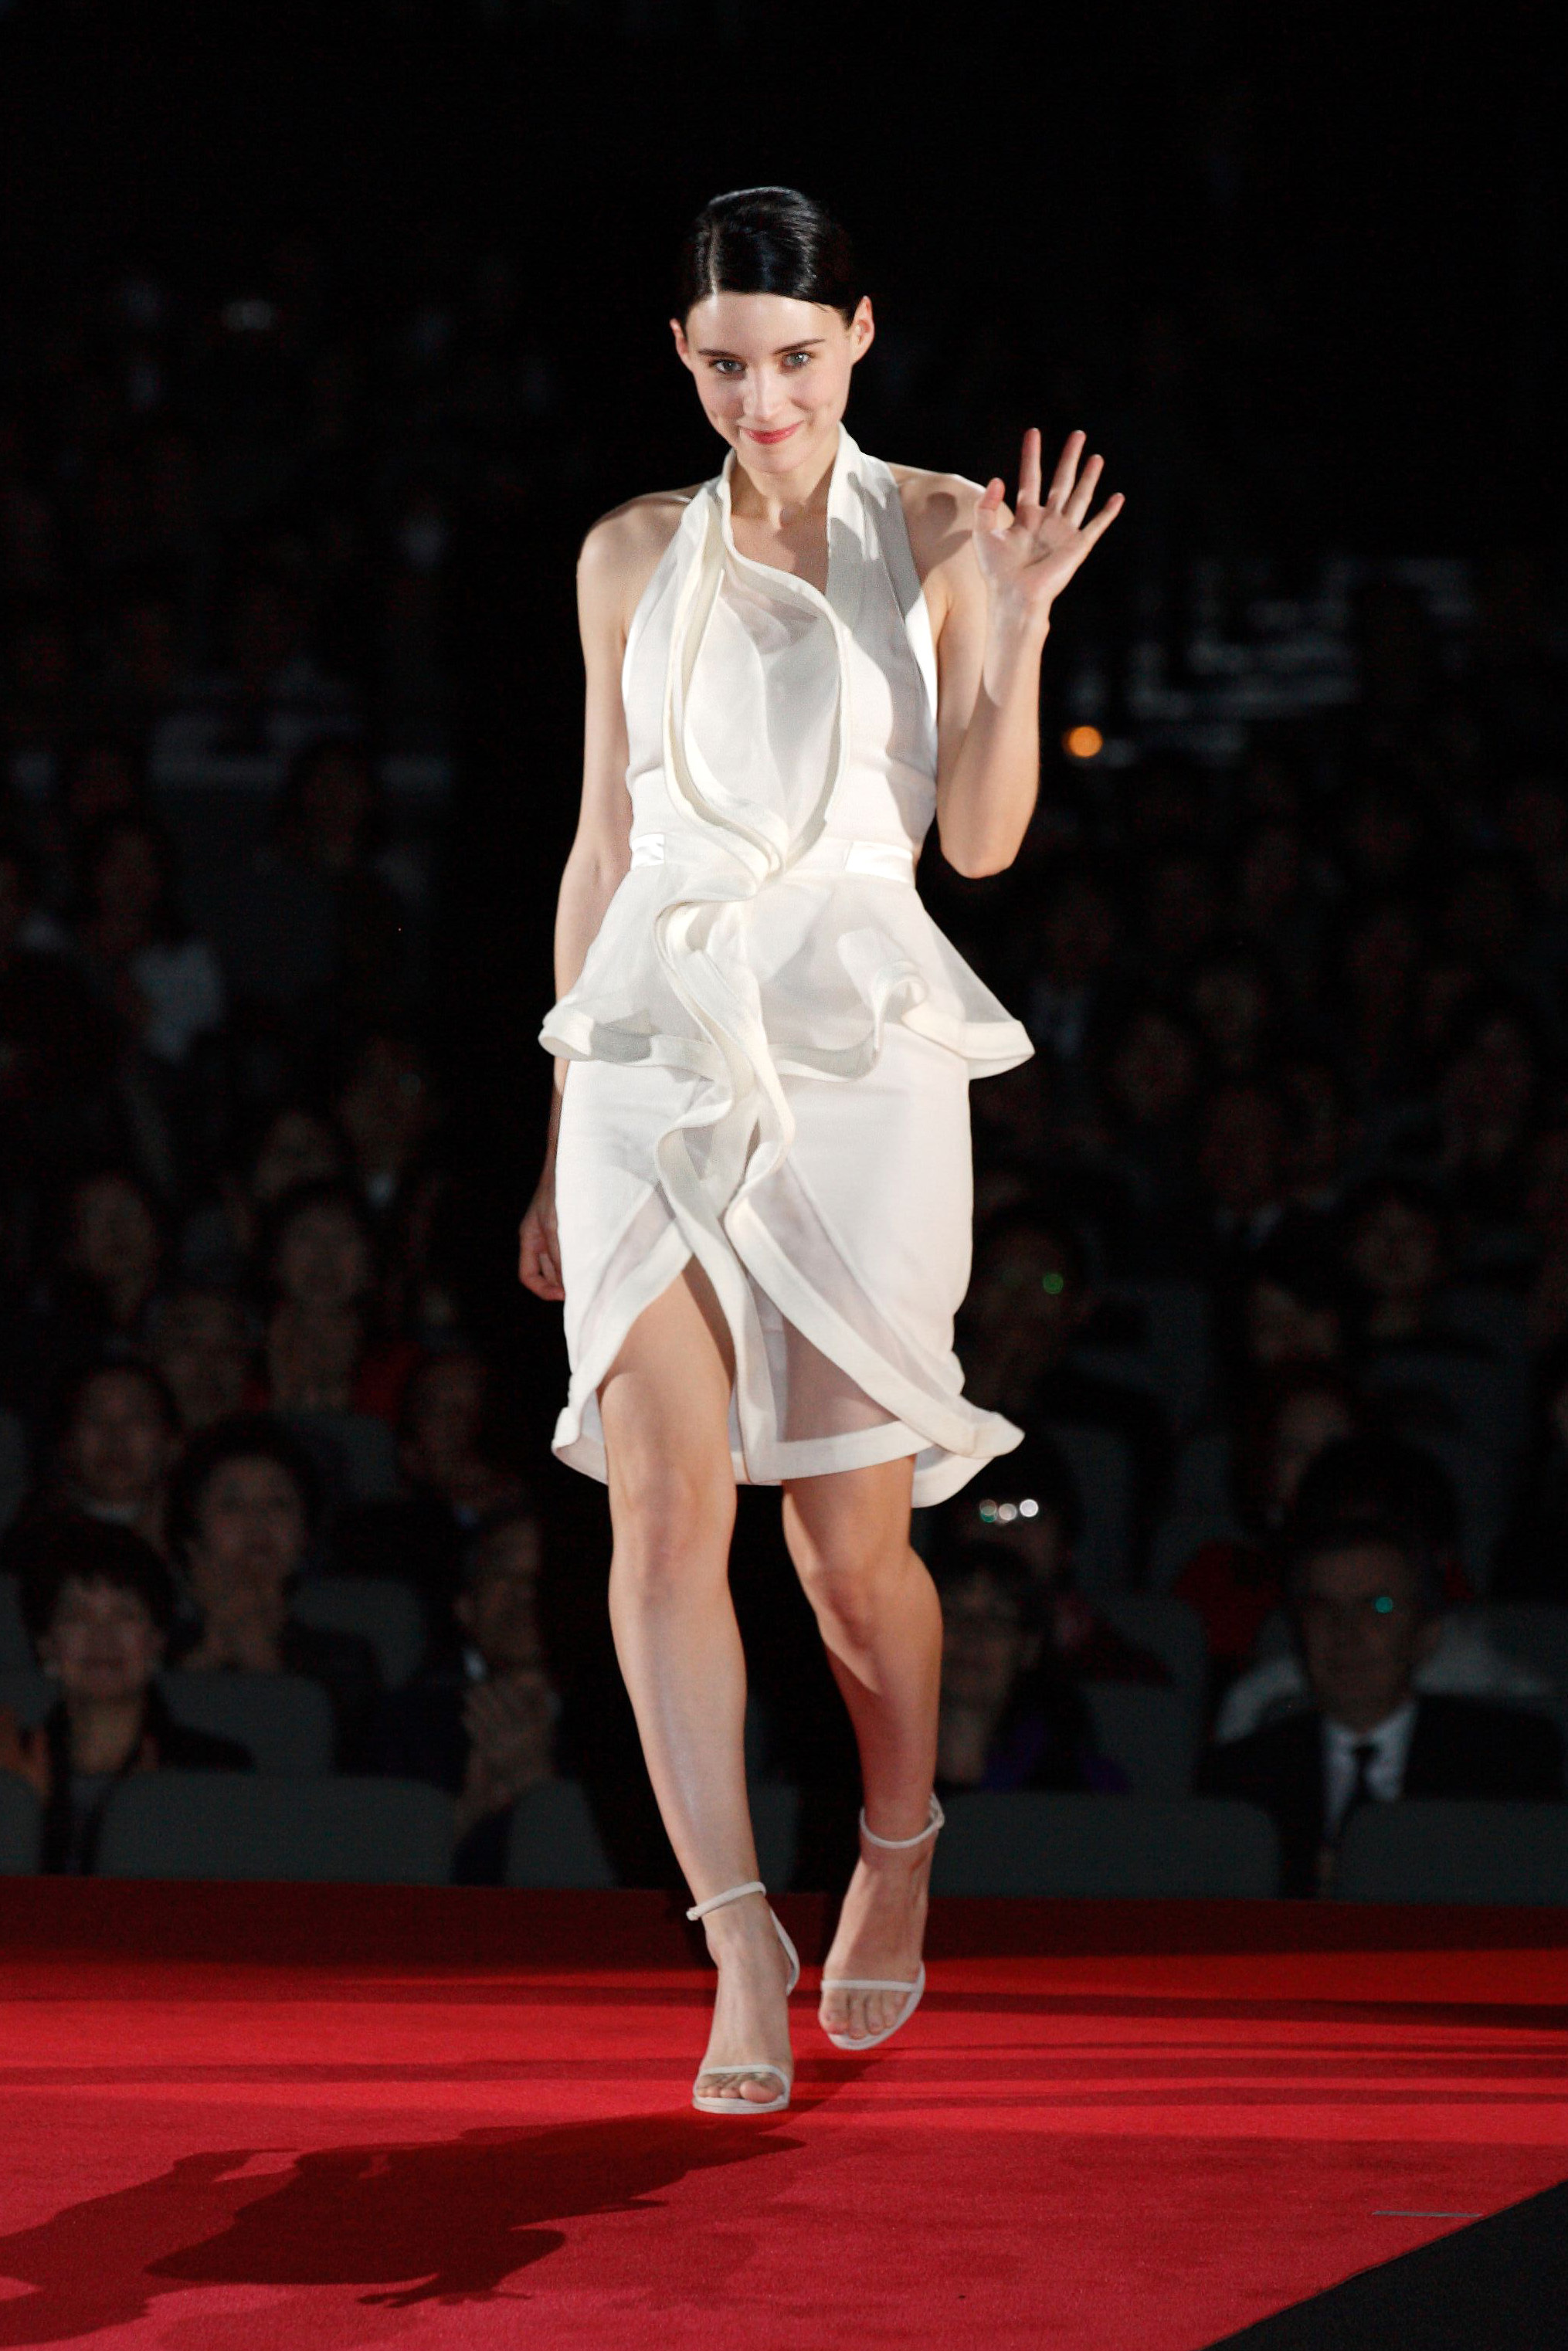 rooney mara fashion face calvin klein model campaign david fincher